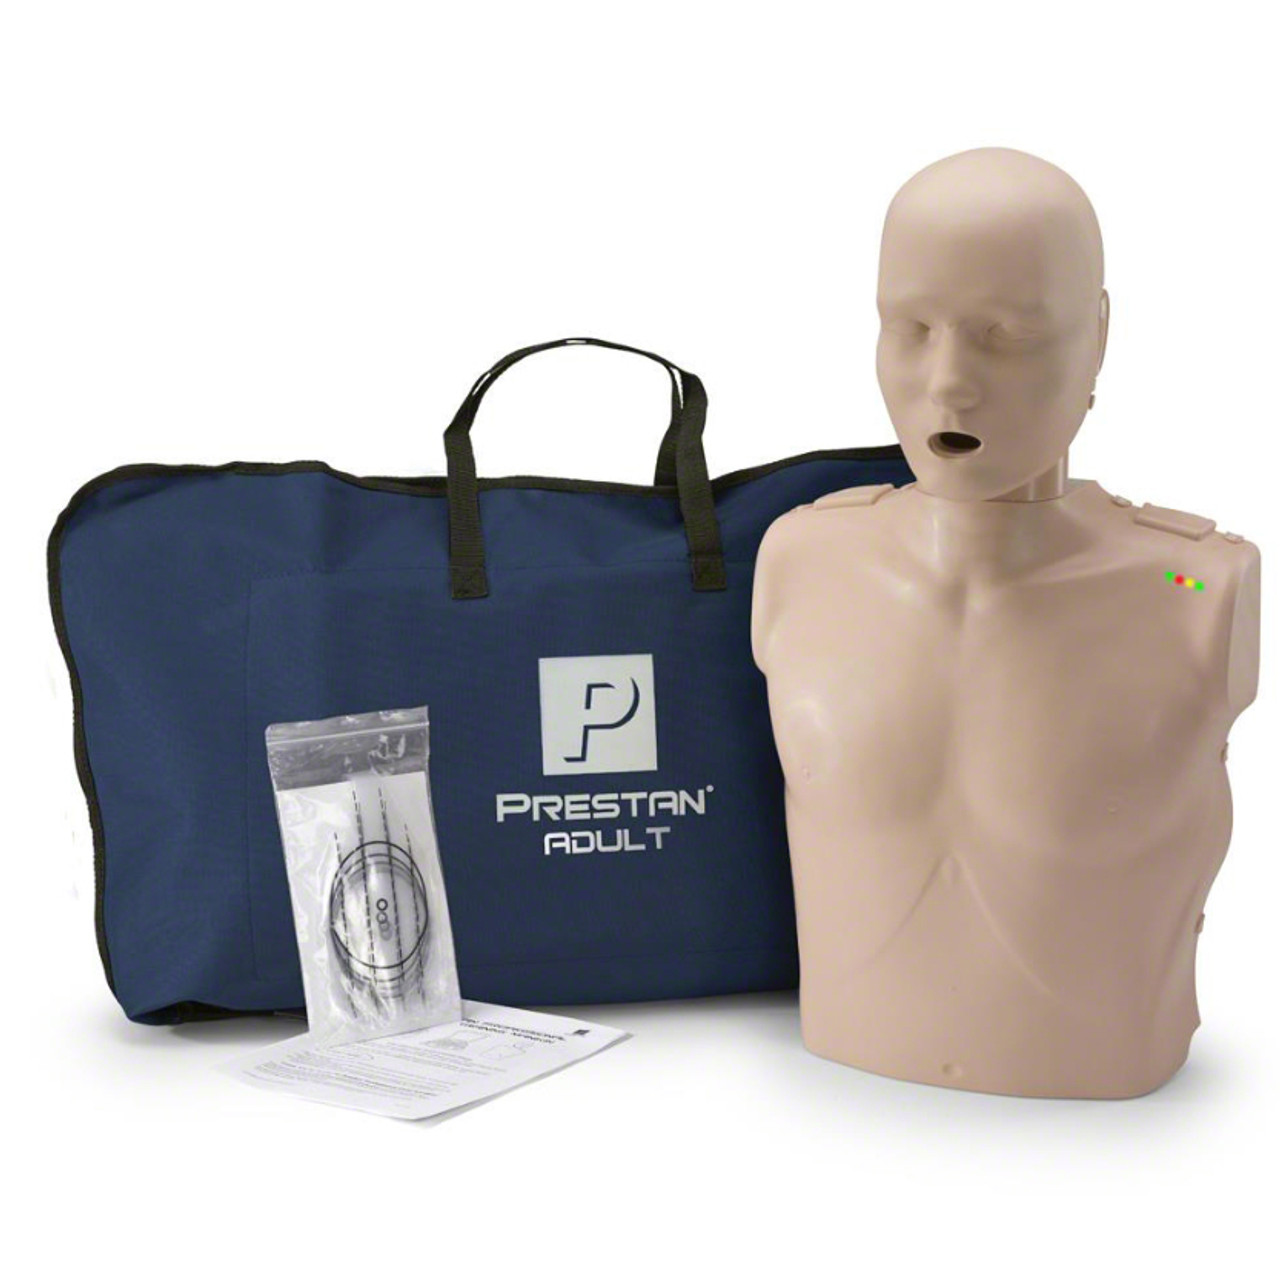 Prestan Manikin (Single), Adult Medium Skin Tone with CPR Monitor